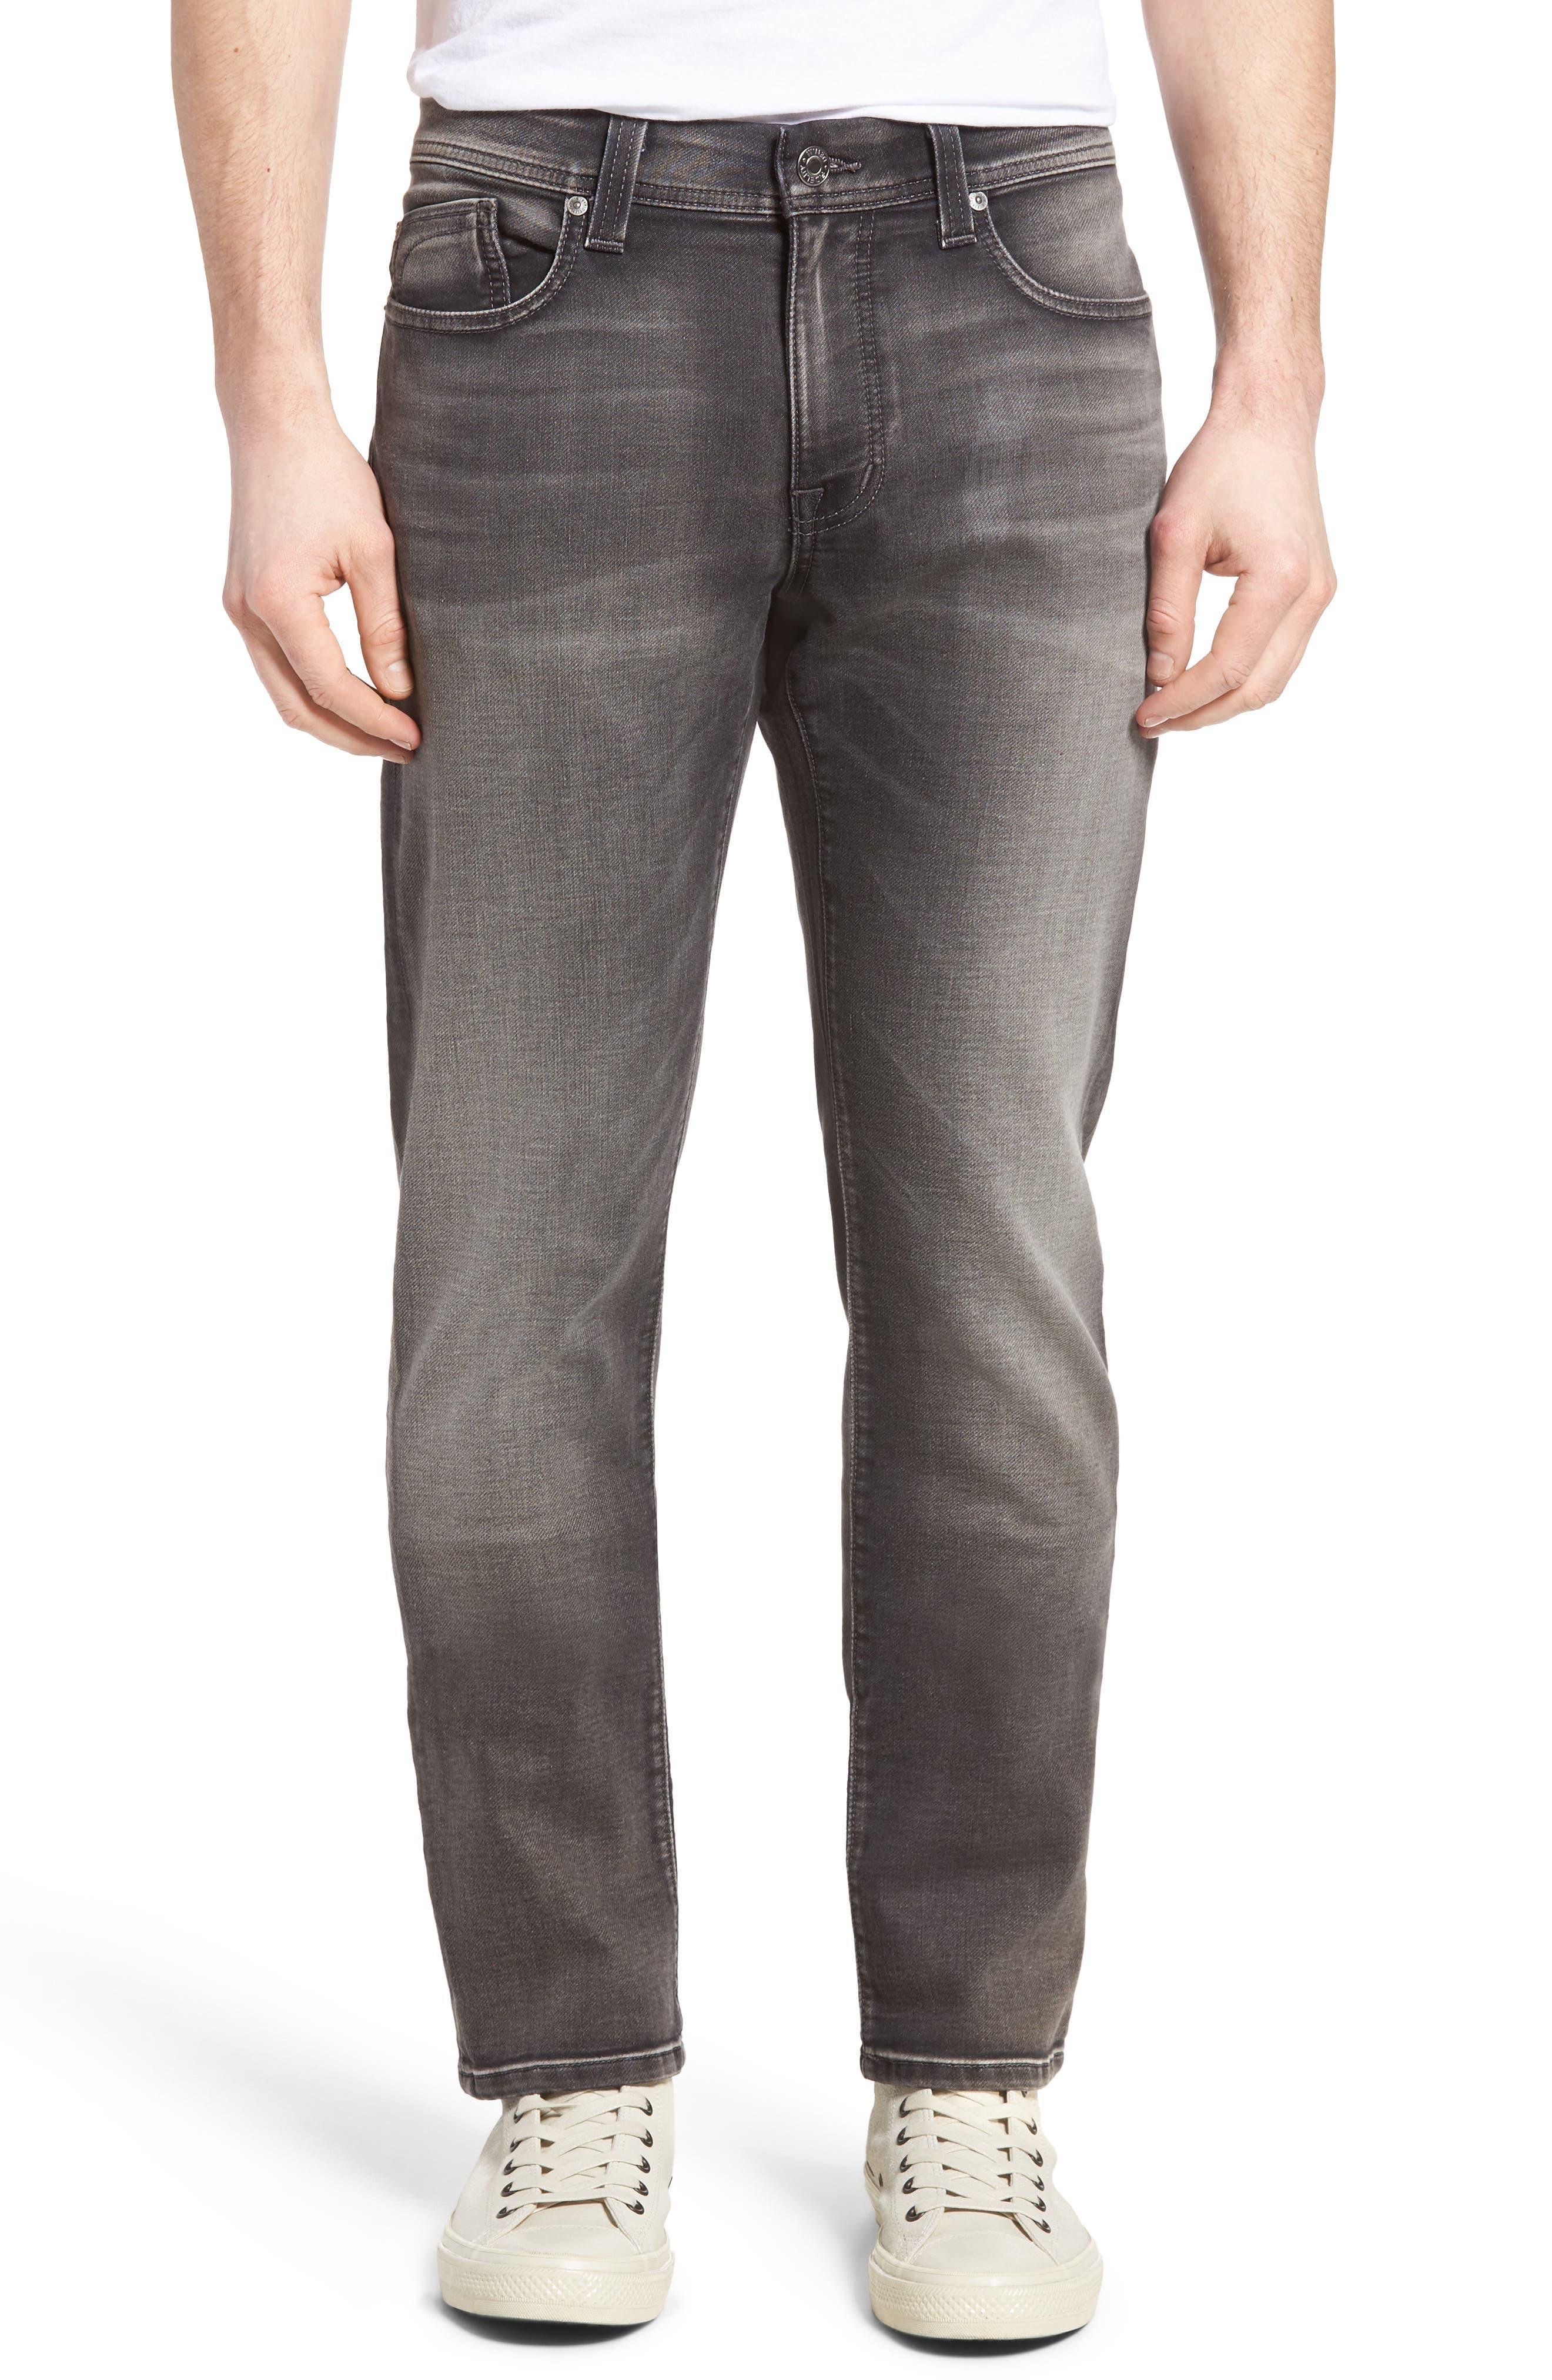 Fidelity Jimmy Slim Fit Jeans,                             Main thumbnail 1, color,                             001